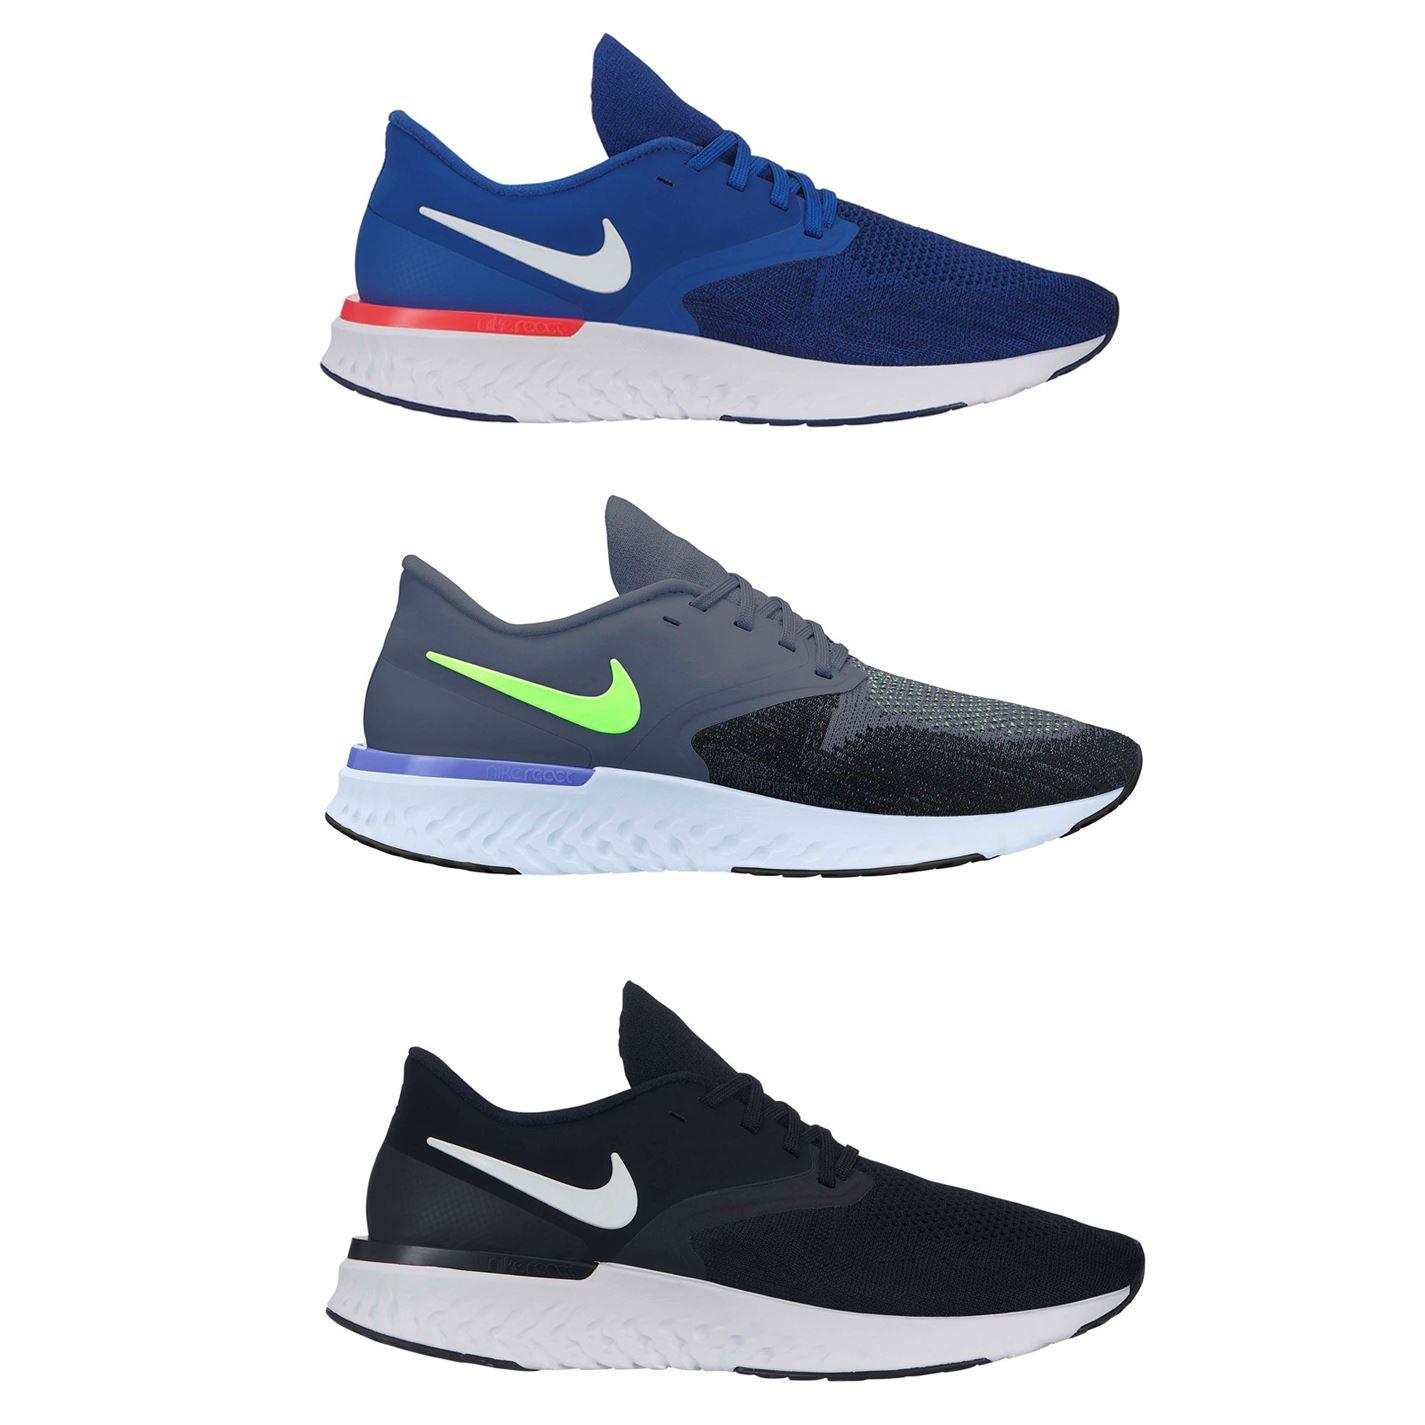 Nike Odyssey React 2 Flyknit Running Shoes Black White Oreo AH1015-100 Men/'s NEW